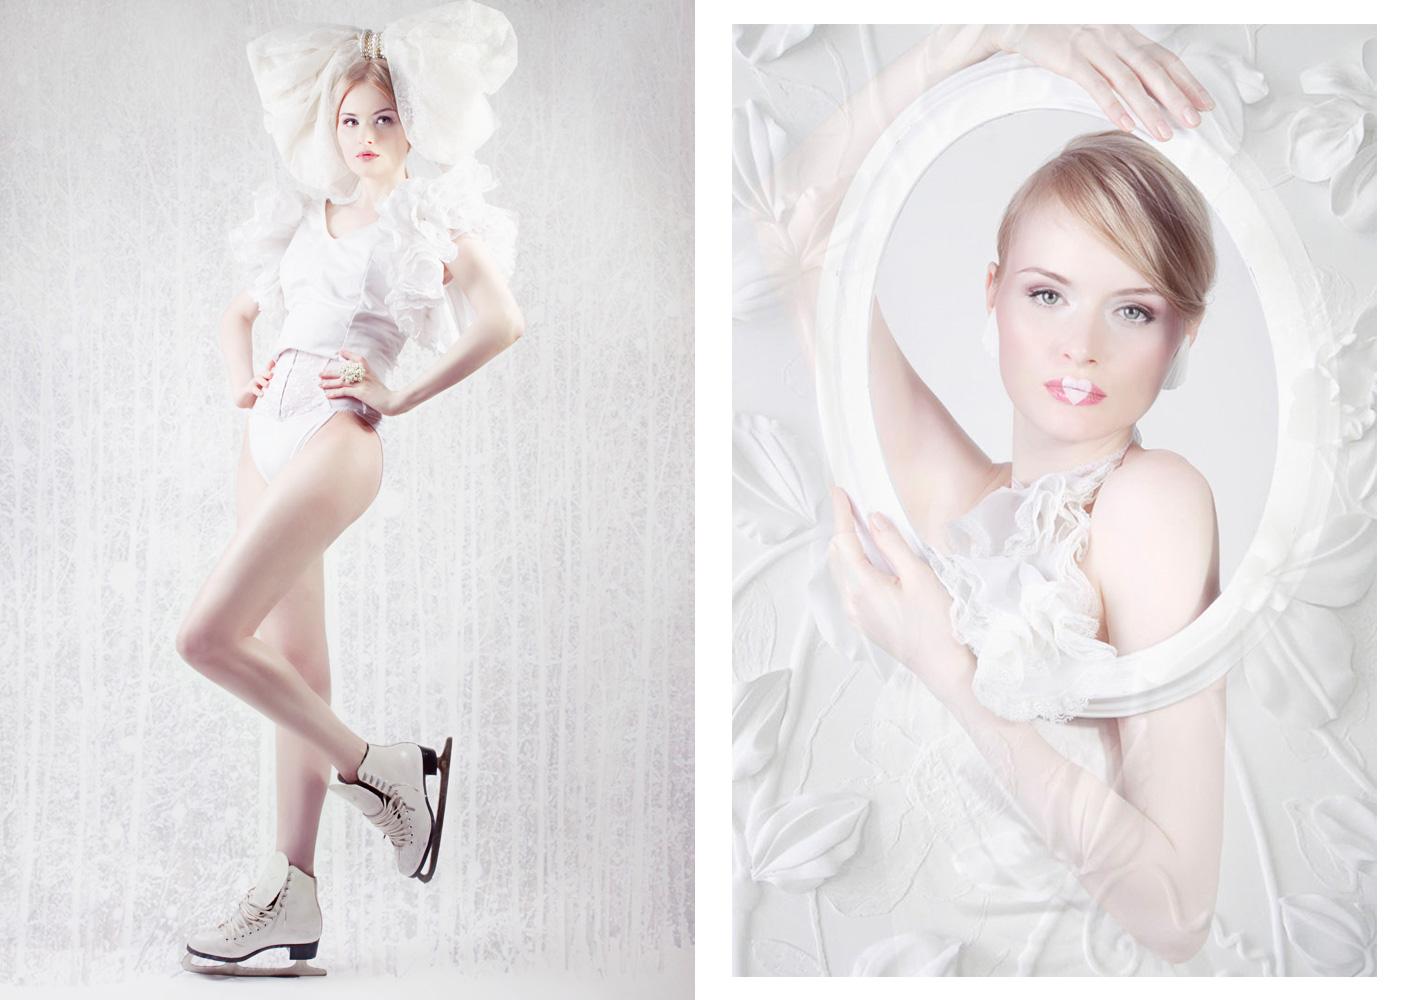 luvisa-pastell-make-up-03